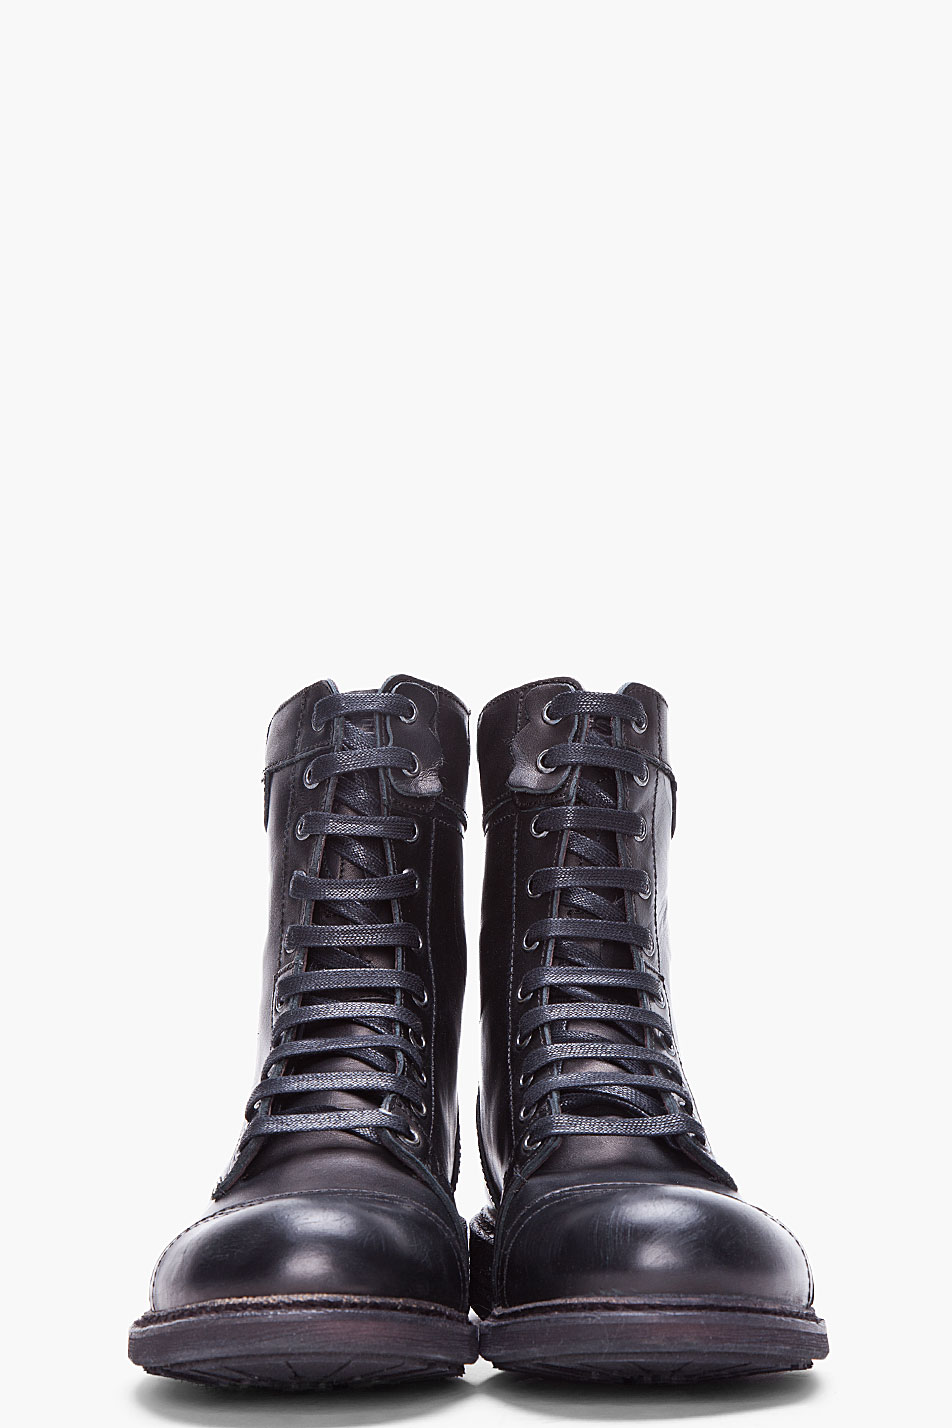 3c1b2dea6b2 DIESEL Black Cassidy Military Boots for men